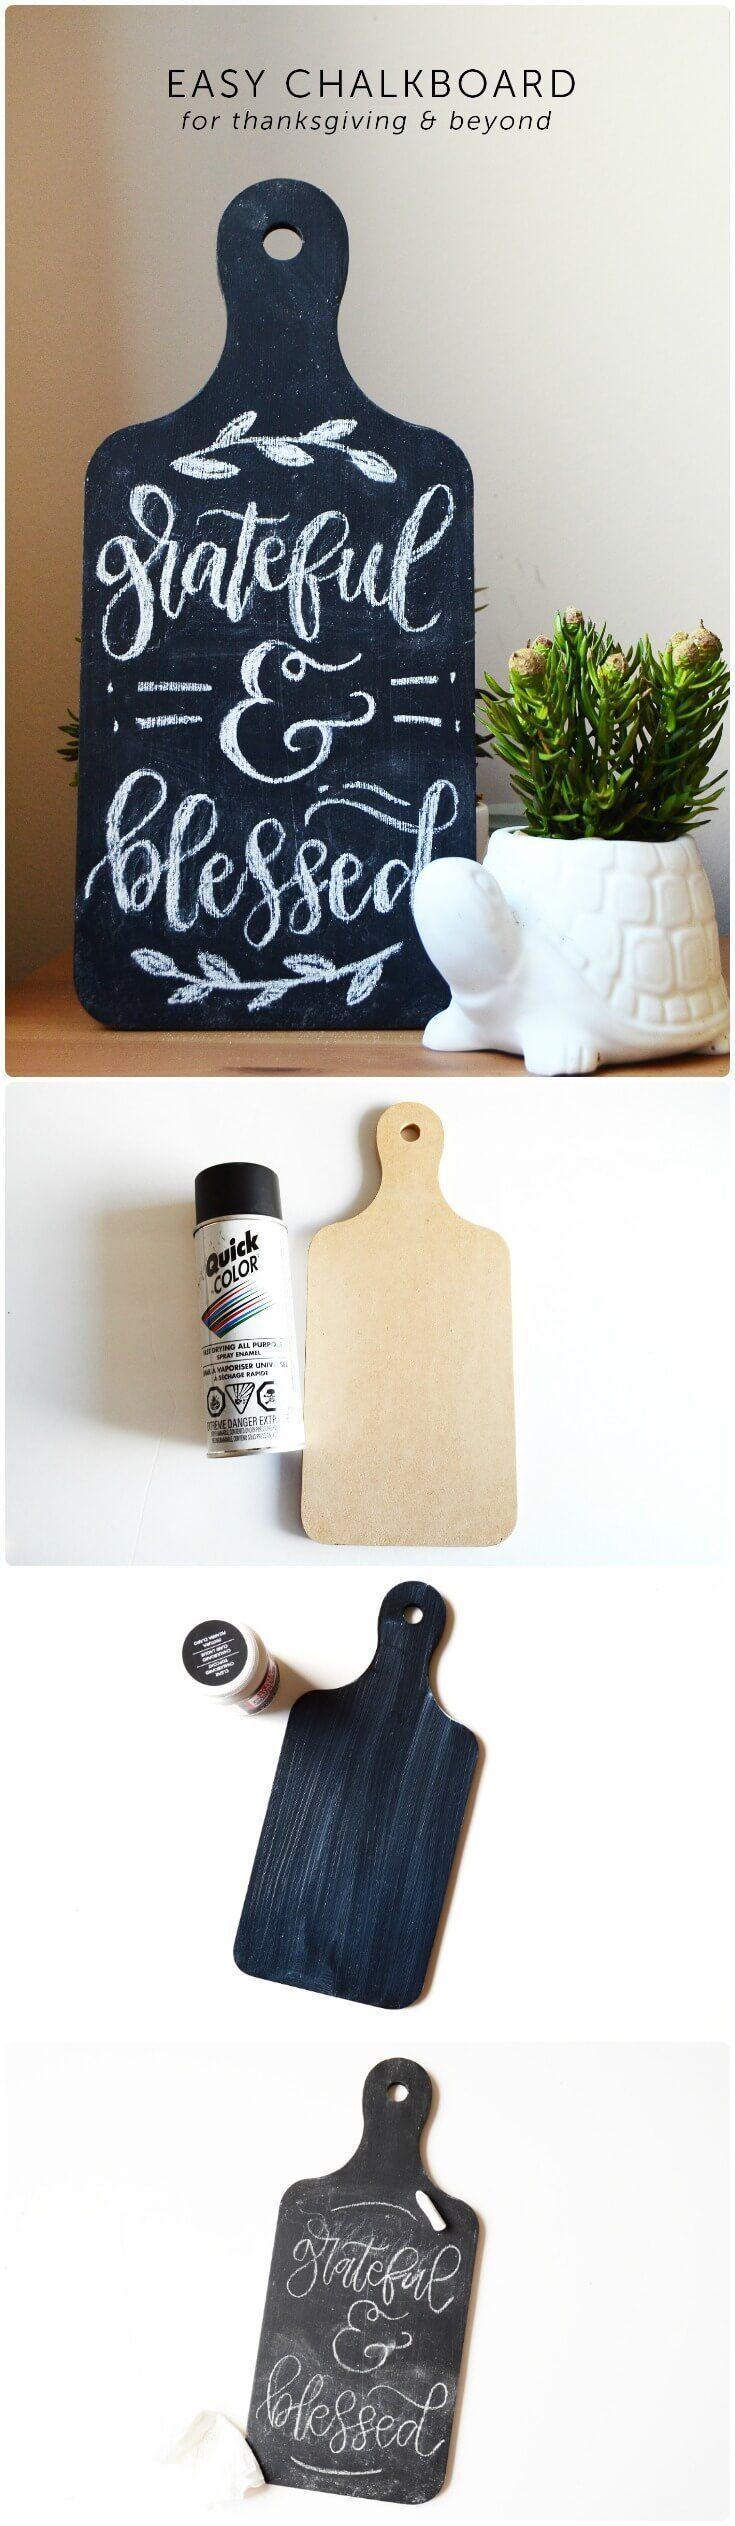 71 best Chalkboard inspiration images on Pinterest | Chalkboard ...